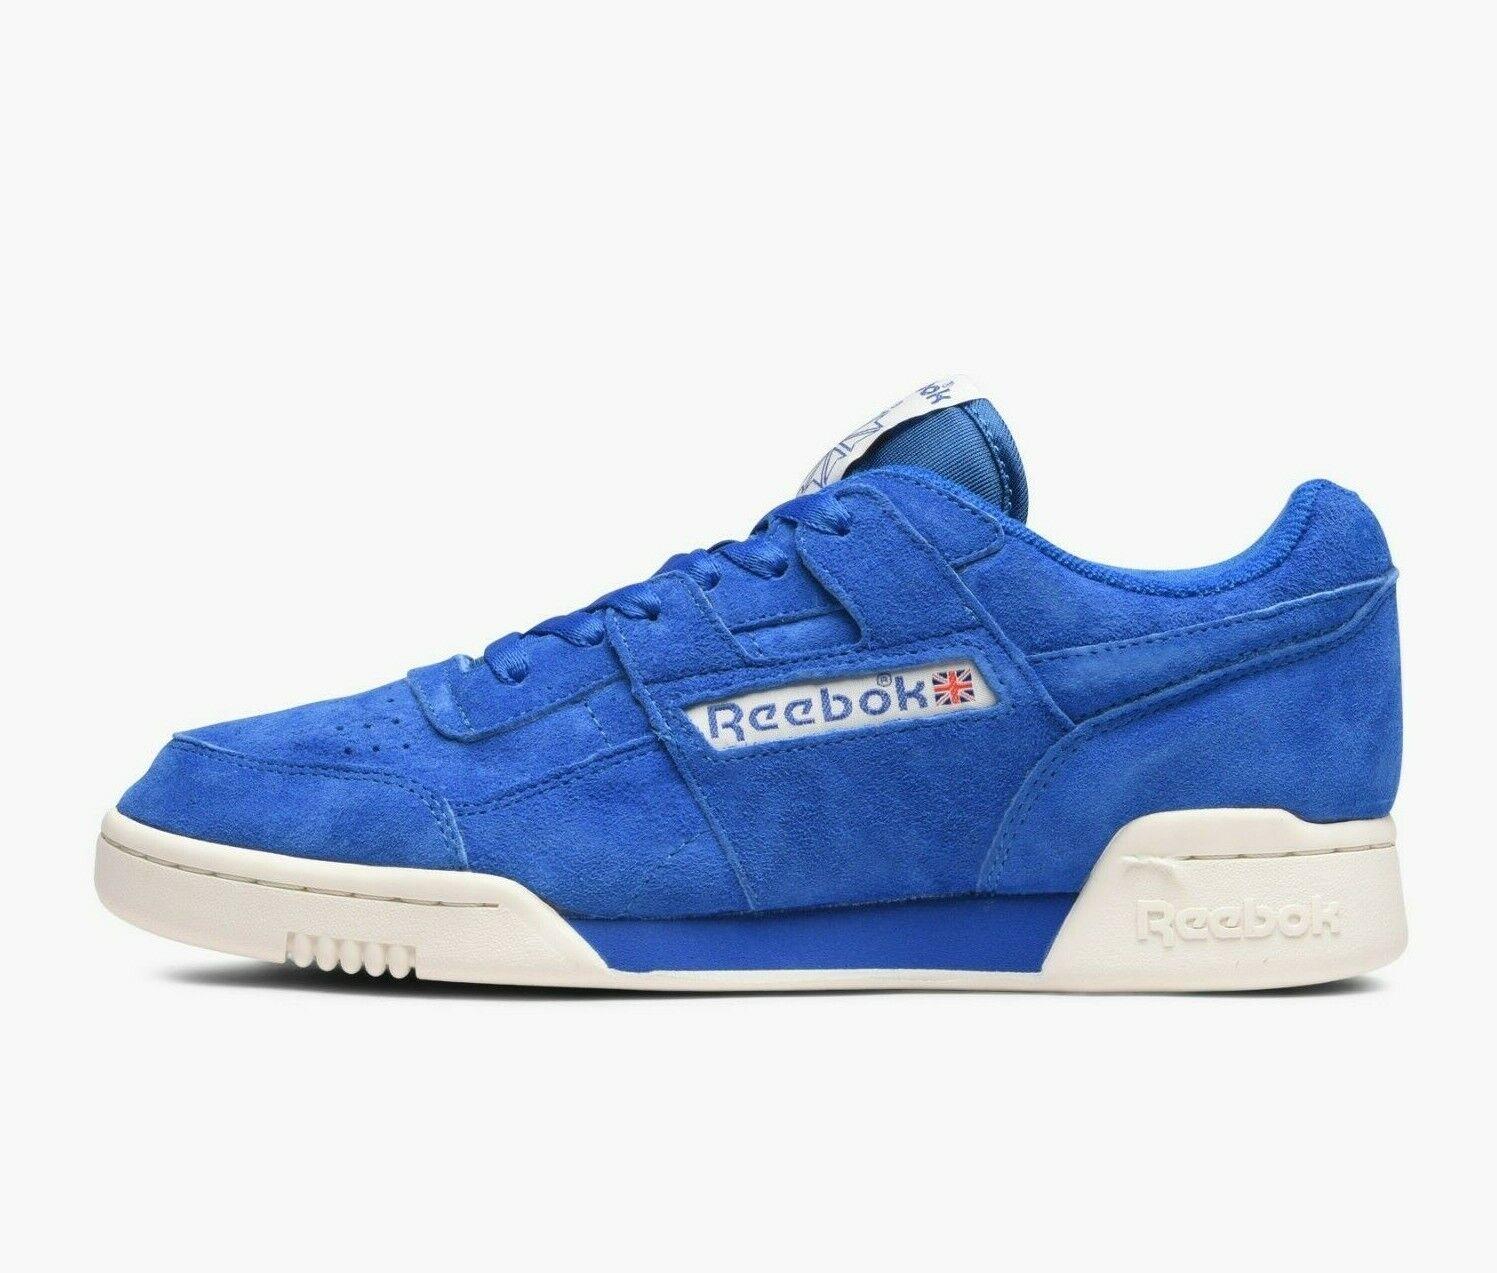 Reebok Homme BD3382 Baskets Sport chaussures Vintage Plus